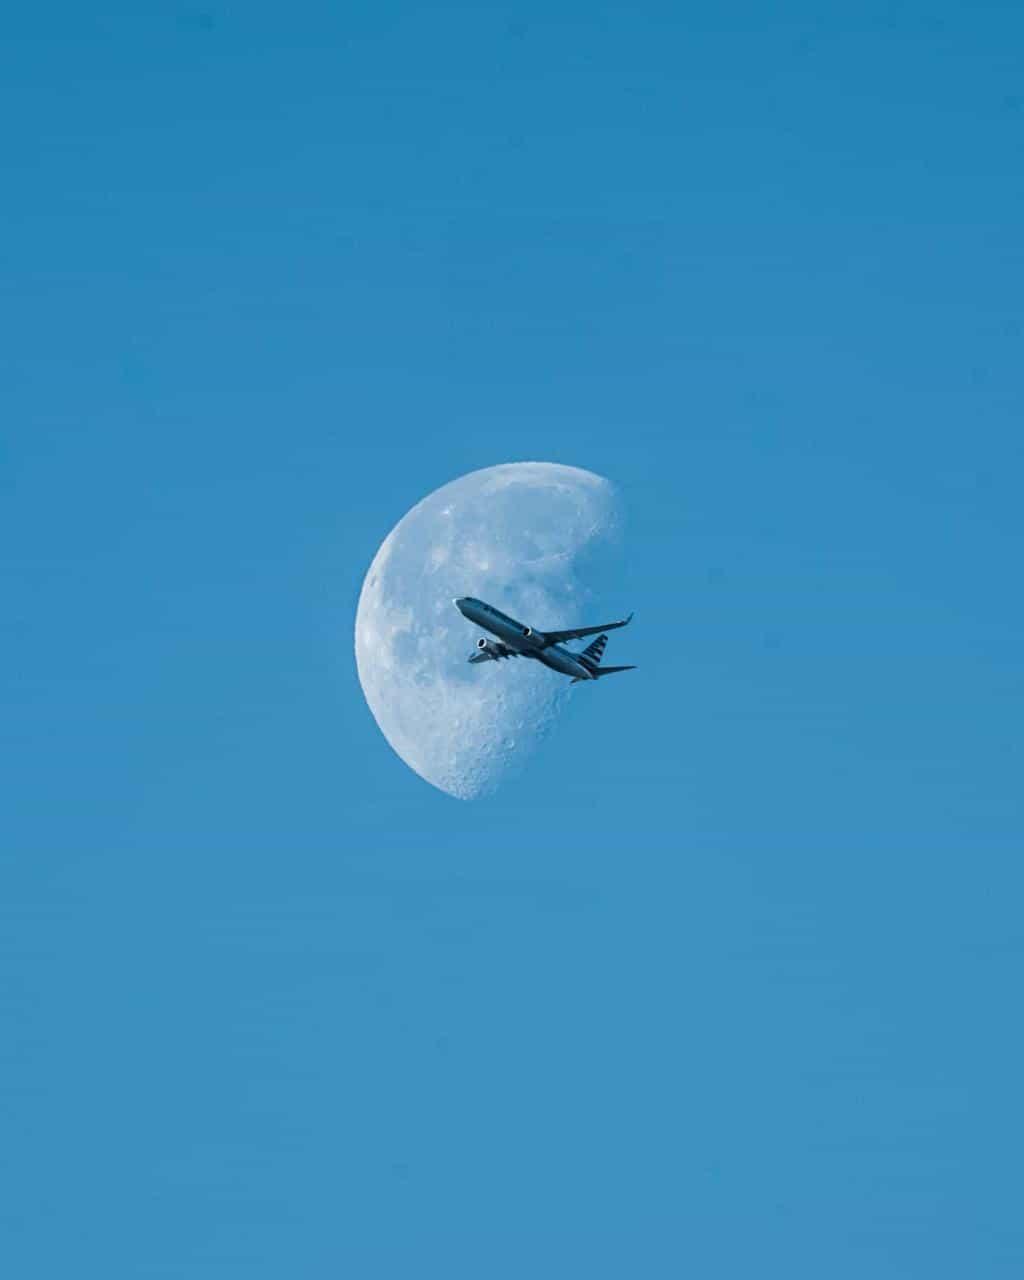 билет на българия ер bulgaria air 1 - Самолетен билет на България Ер (Bulgaria air)